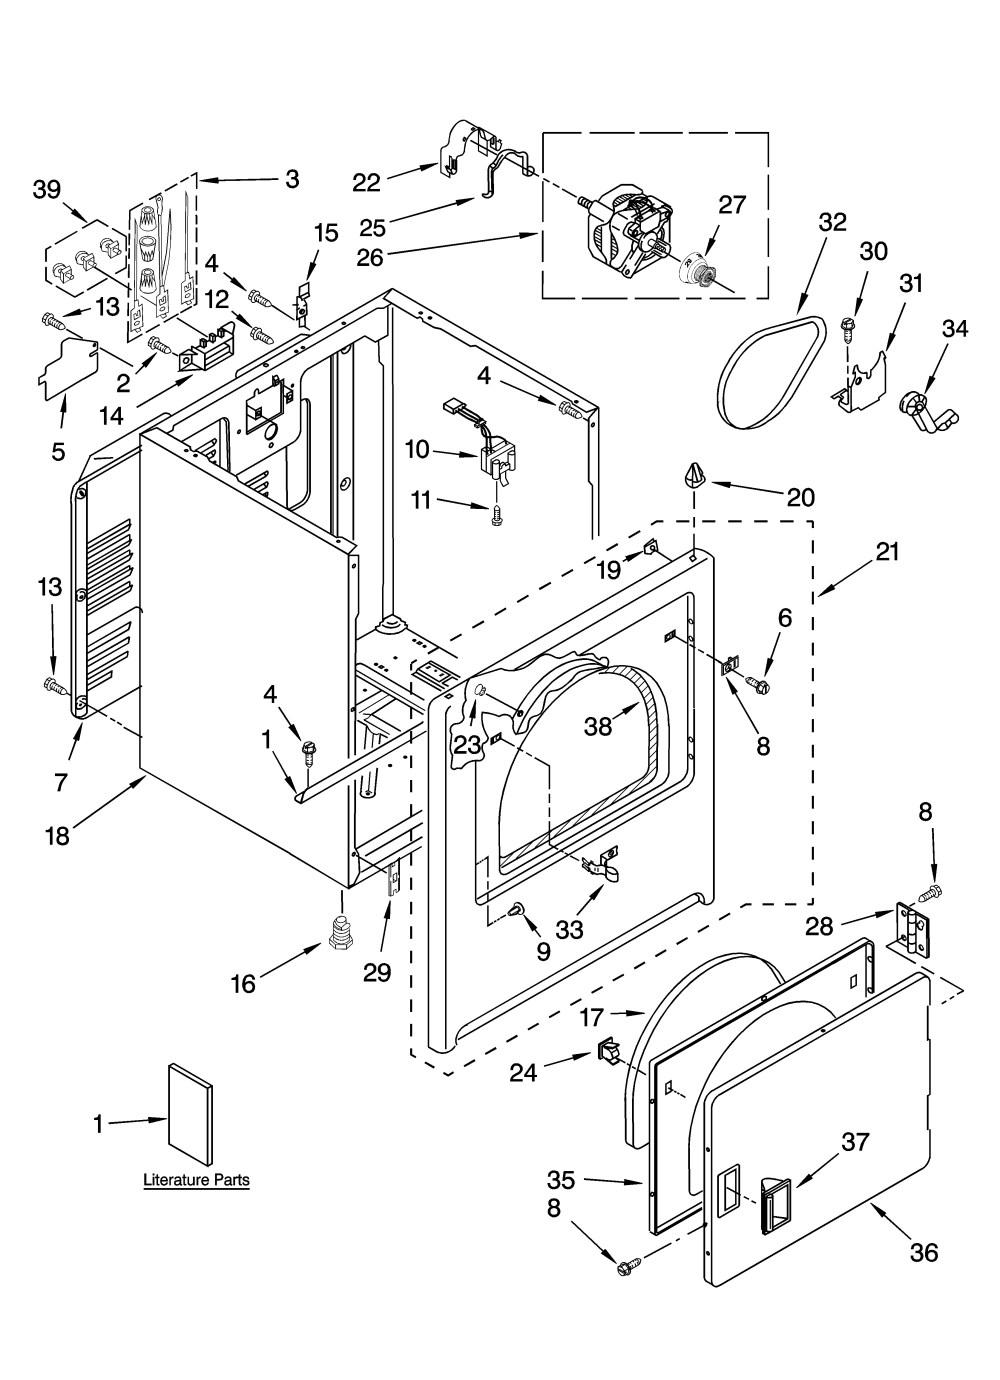 medium resolution of admiral dryer wiring diagram download admiral dryer parts diagram unique admiral admiral laundry parts model